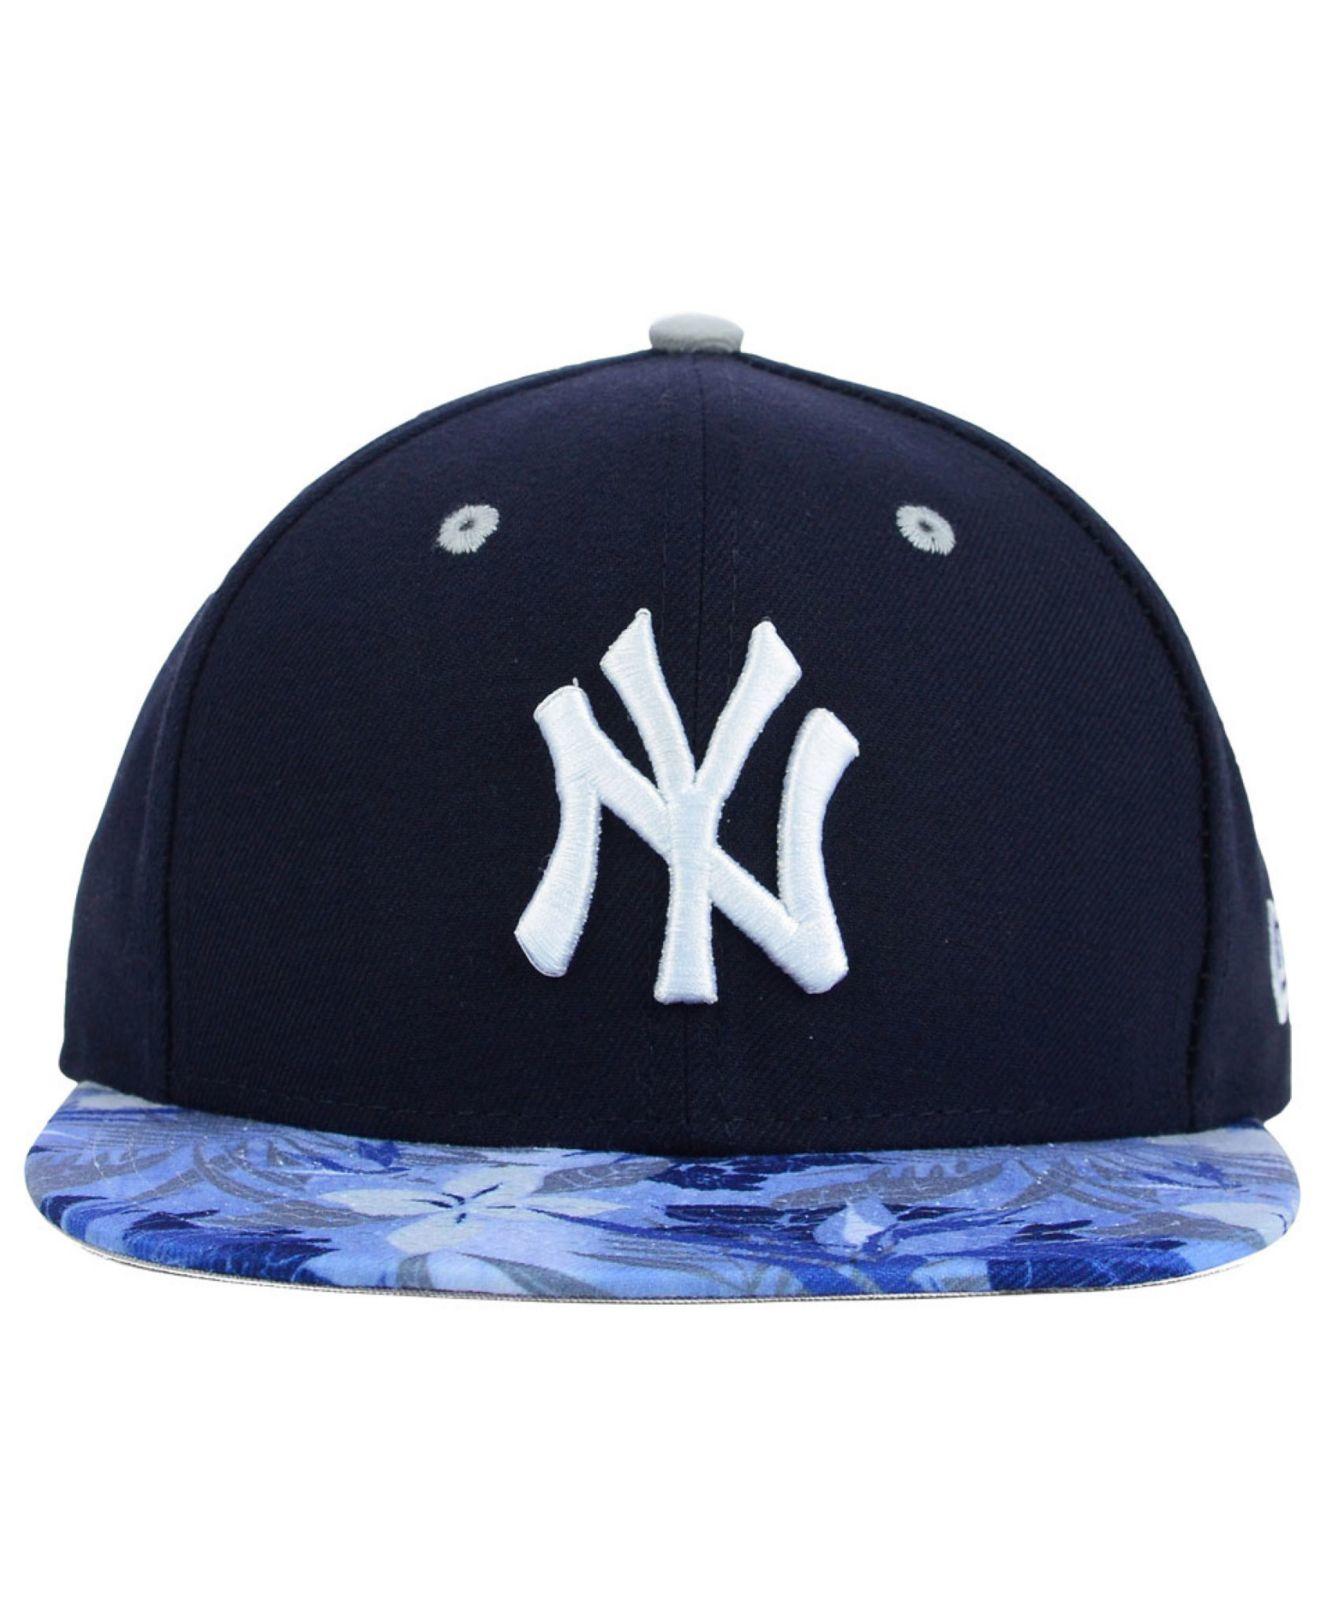 2f93096a8ce Lyst - KTZ New York Yankees Floral Viz 9fifty Snapback Cap in Blue ...